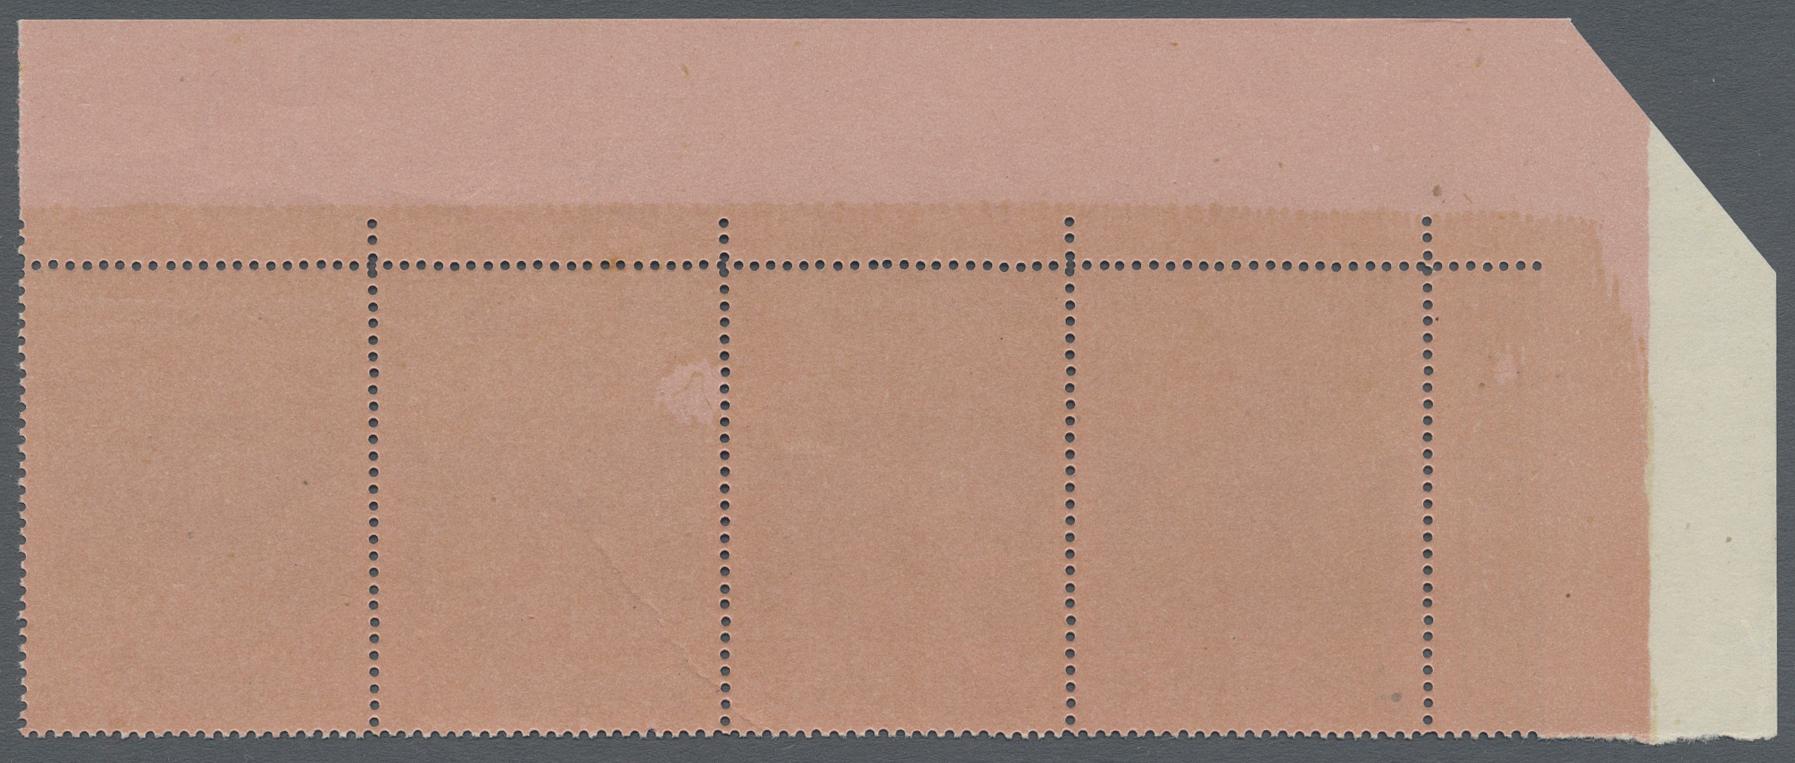 Lot 19618 - nachlässe  -  Auktionshaus Christoph Gärtner GmbH & Co. KG Sale #48 Estates, supplement Germany before & after 1945